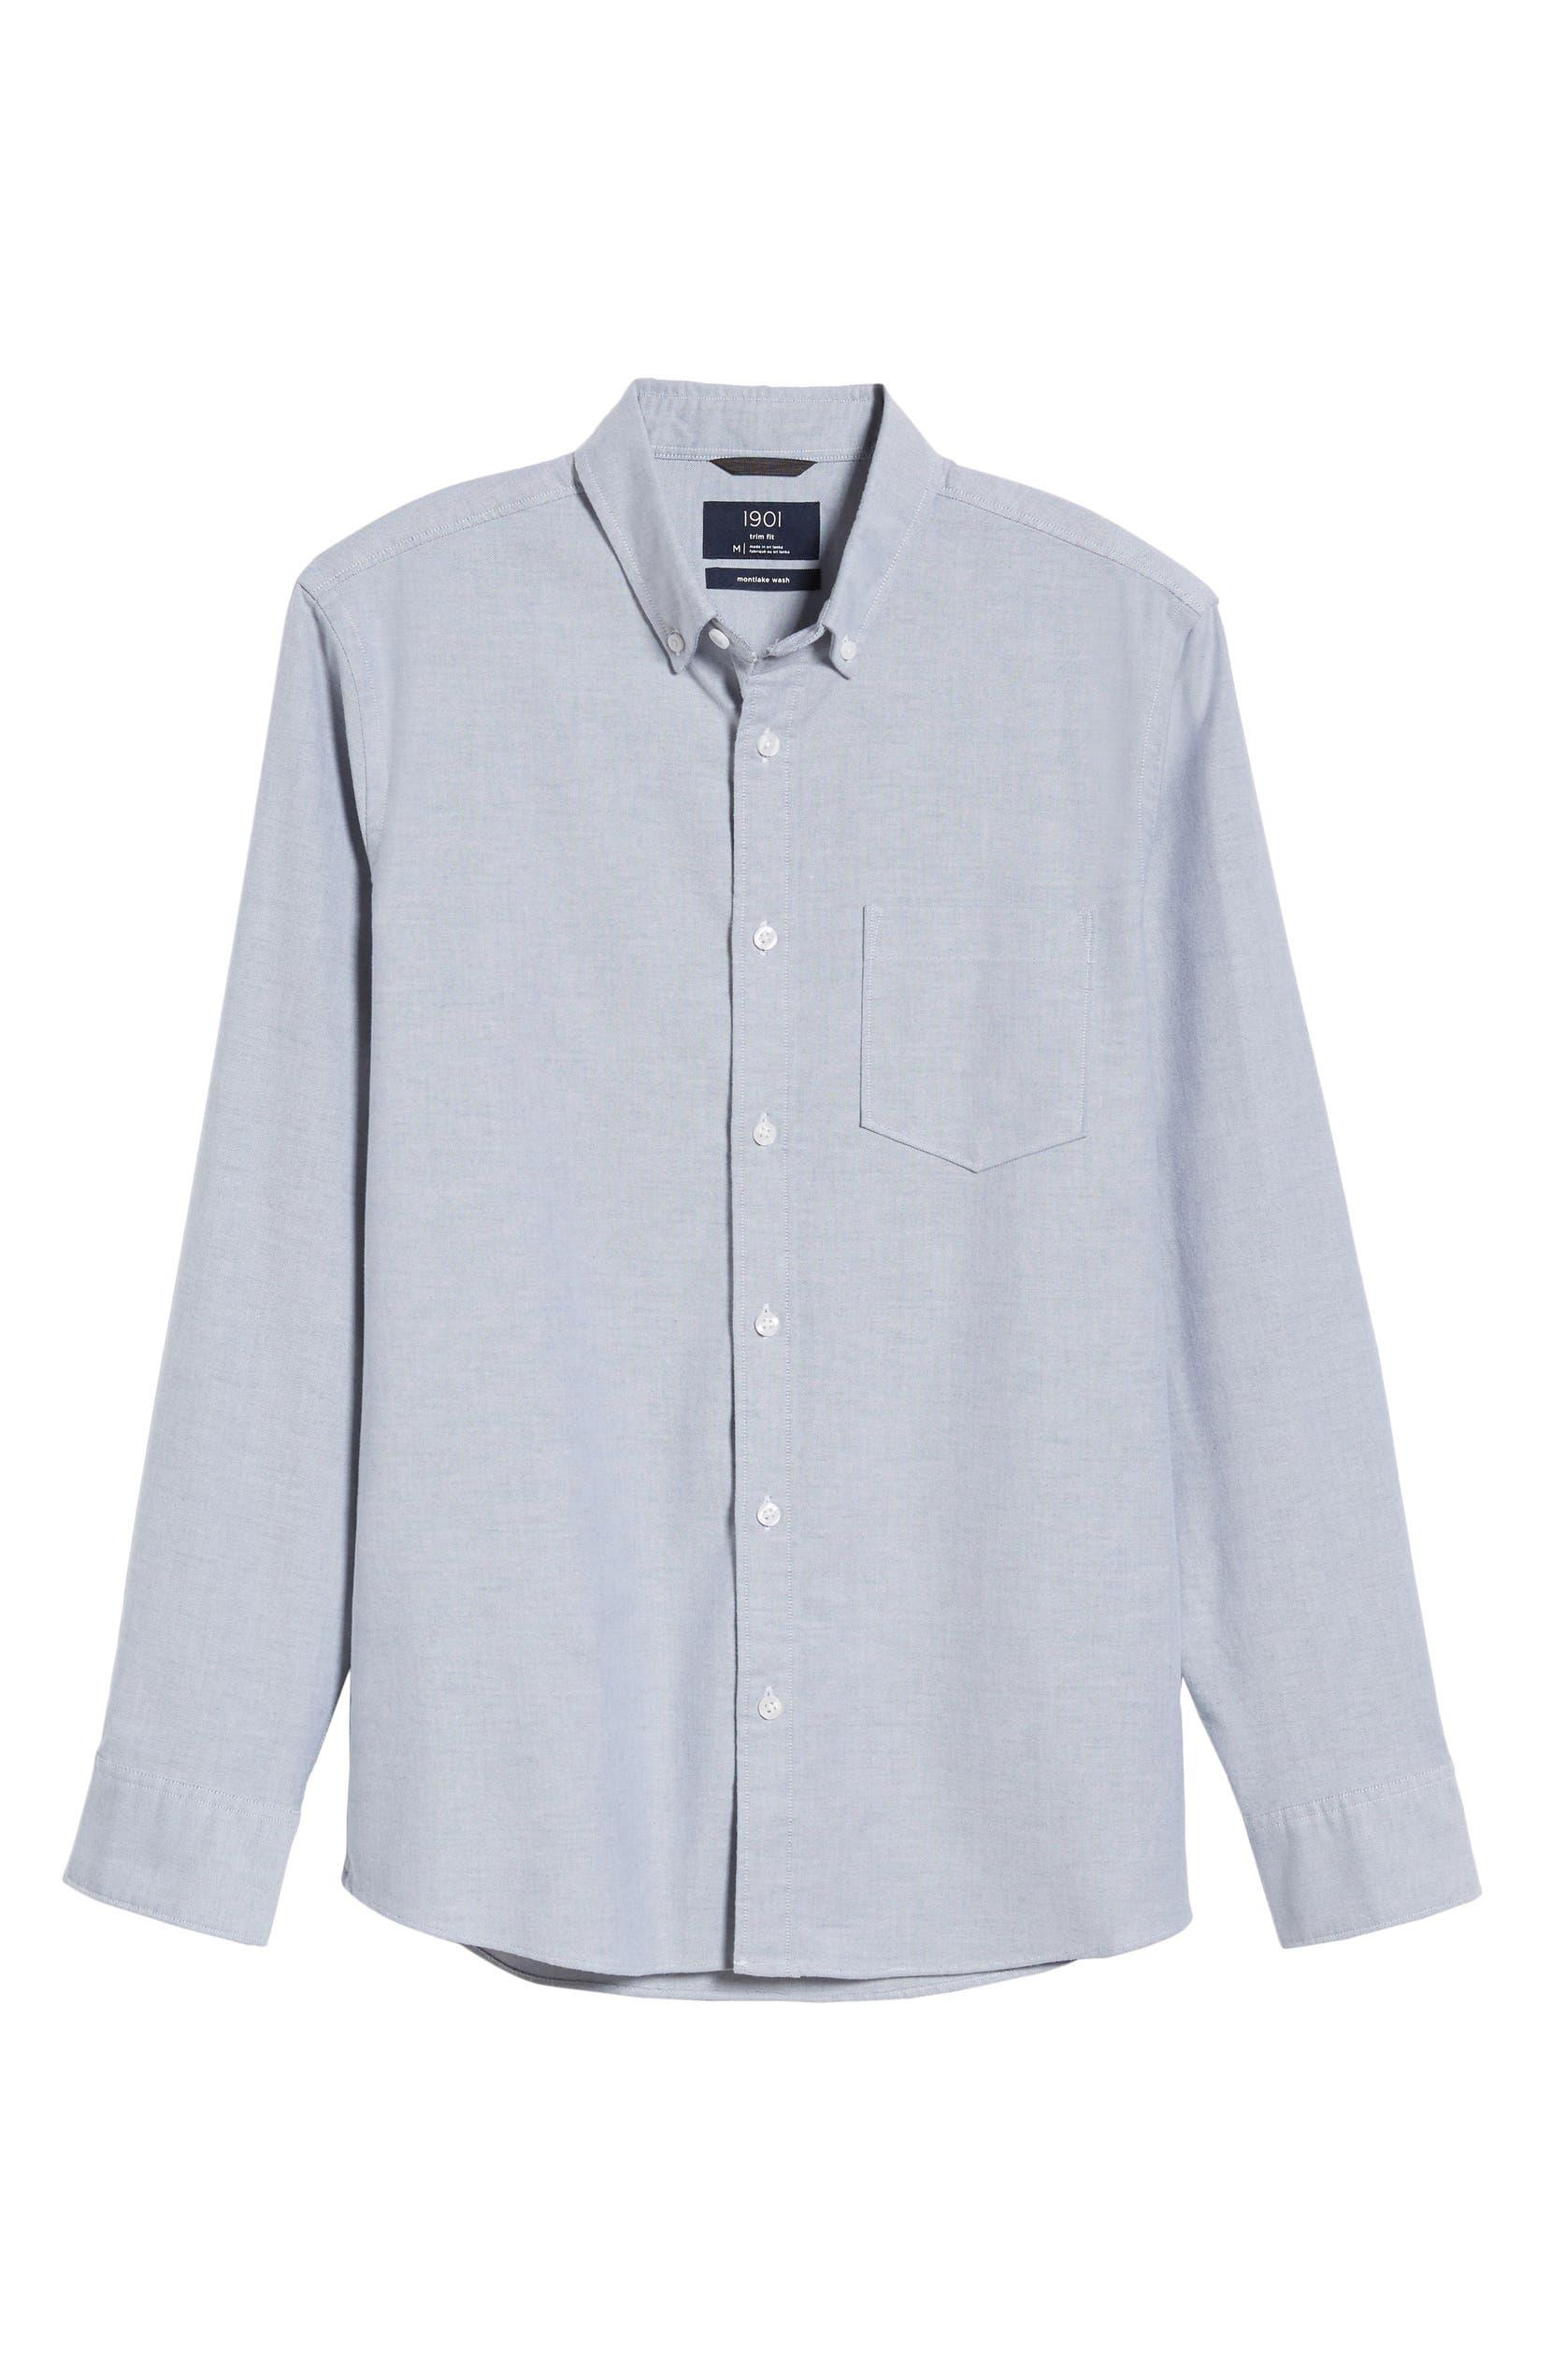 1901 Trim Fit Washed Oxford Shirt Nordstrom